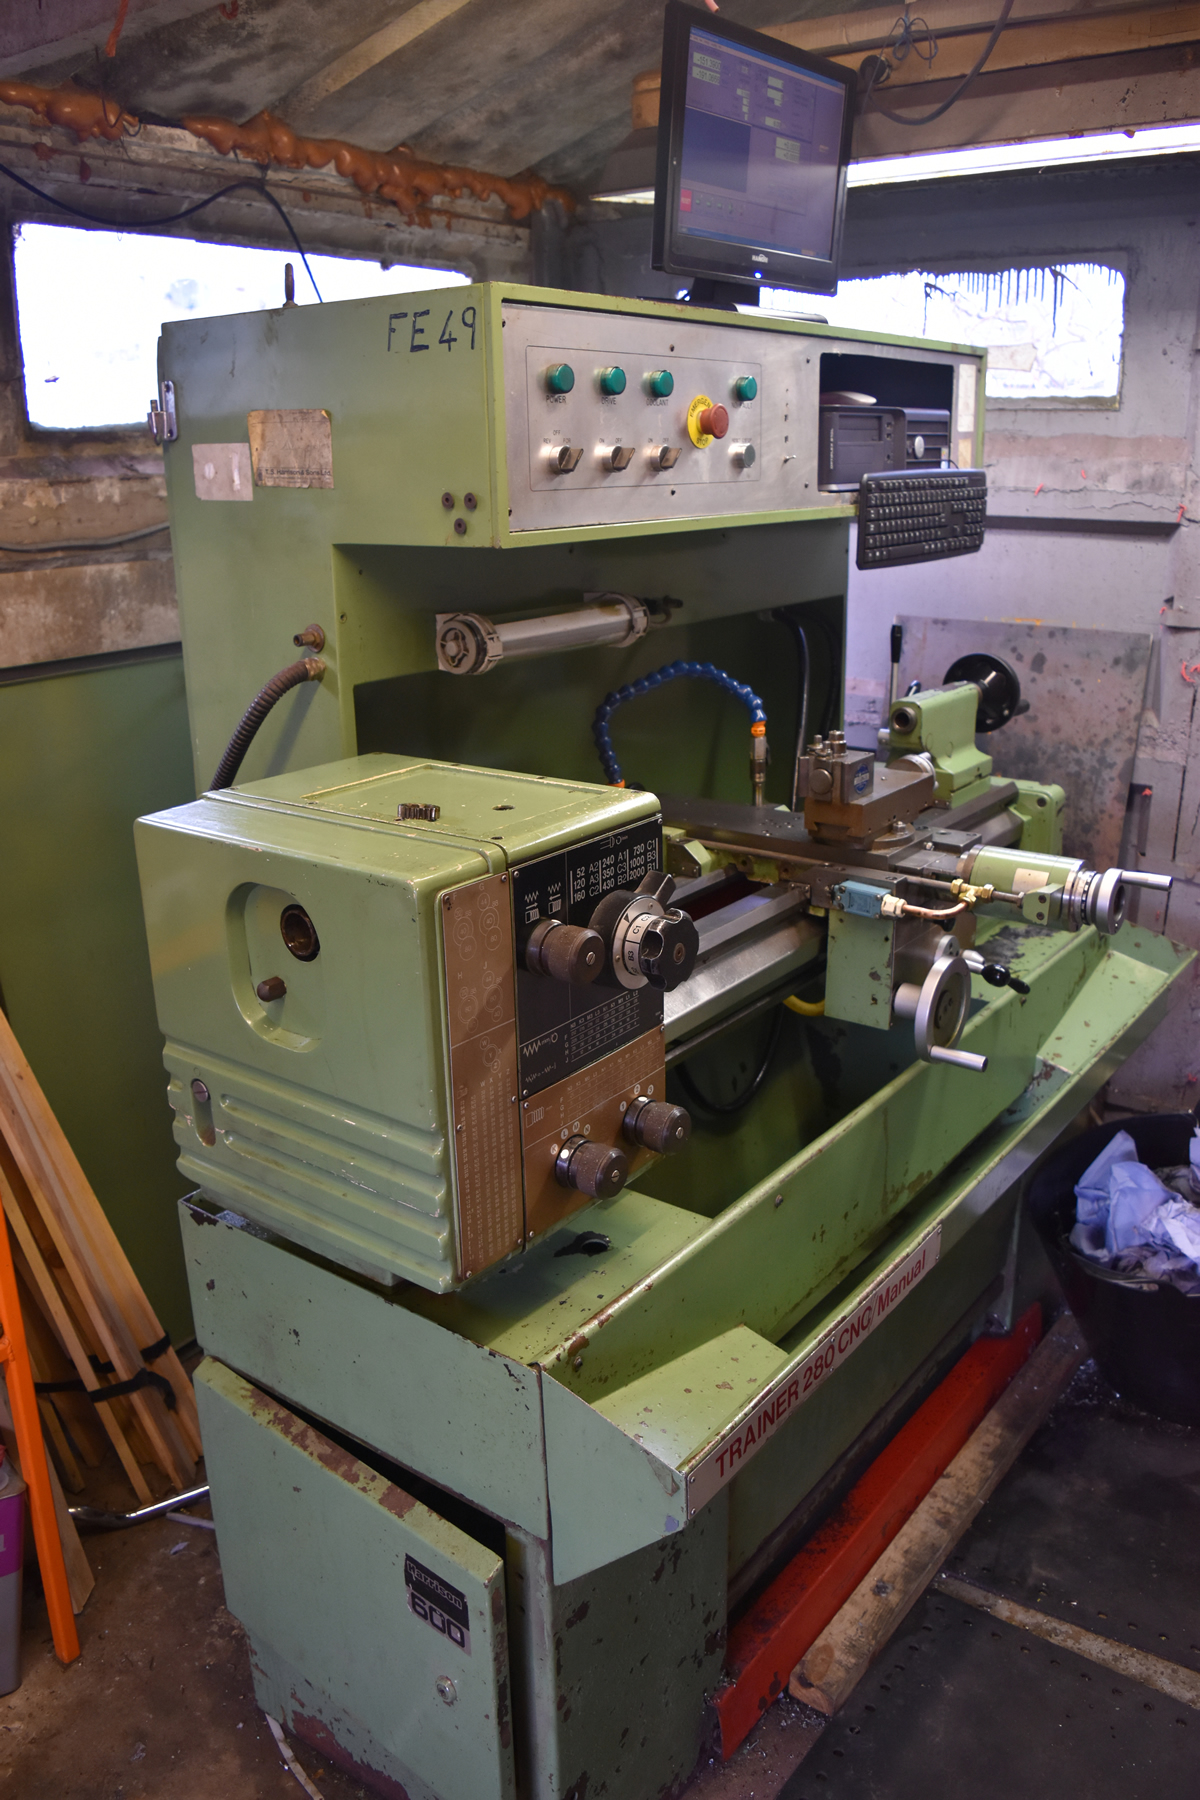 harrison m250 lathe manual machine crisealpine rh crisealpine weebly com Harrison Lathe 11 Inch Swing Harrison Engine Lathe